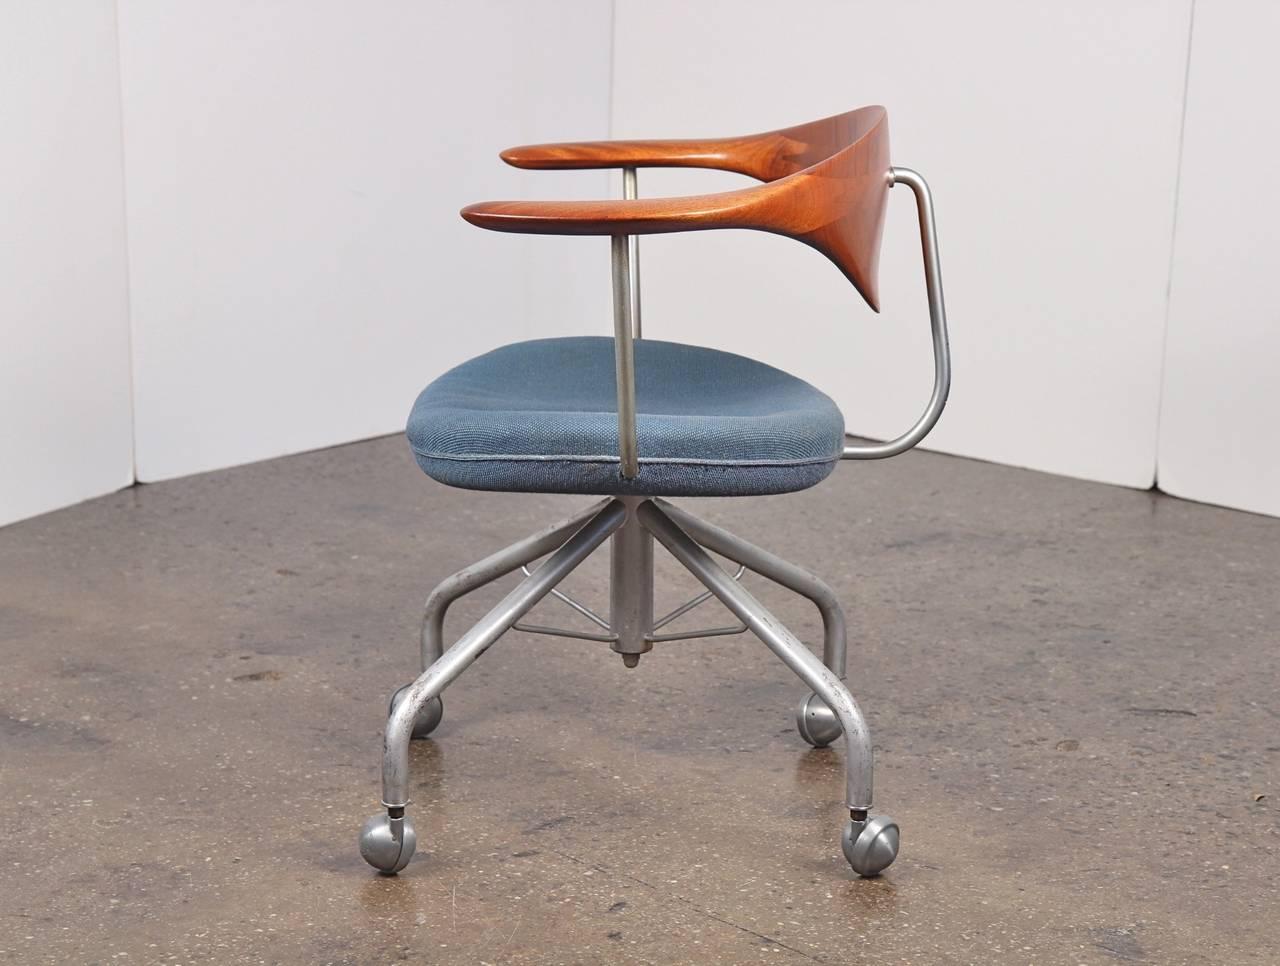 steel chair joints graco blossom high buy baby 1955 hans wegner swivel at 1stdibs